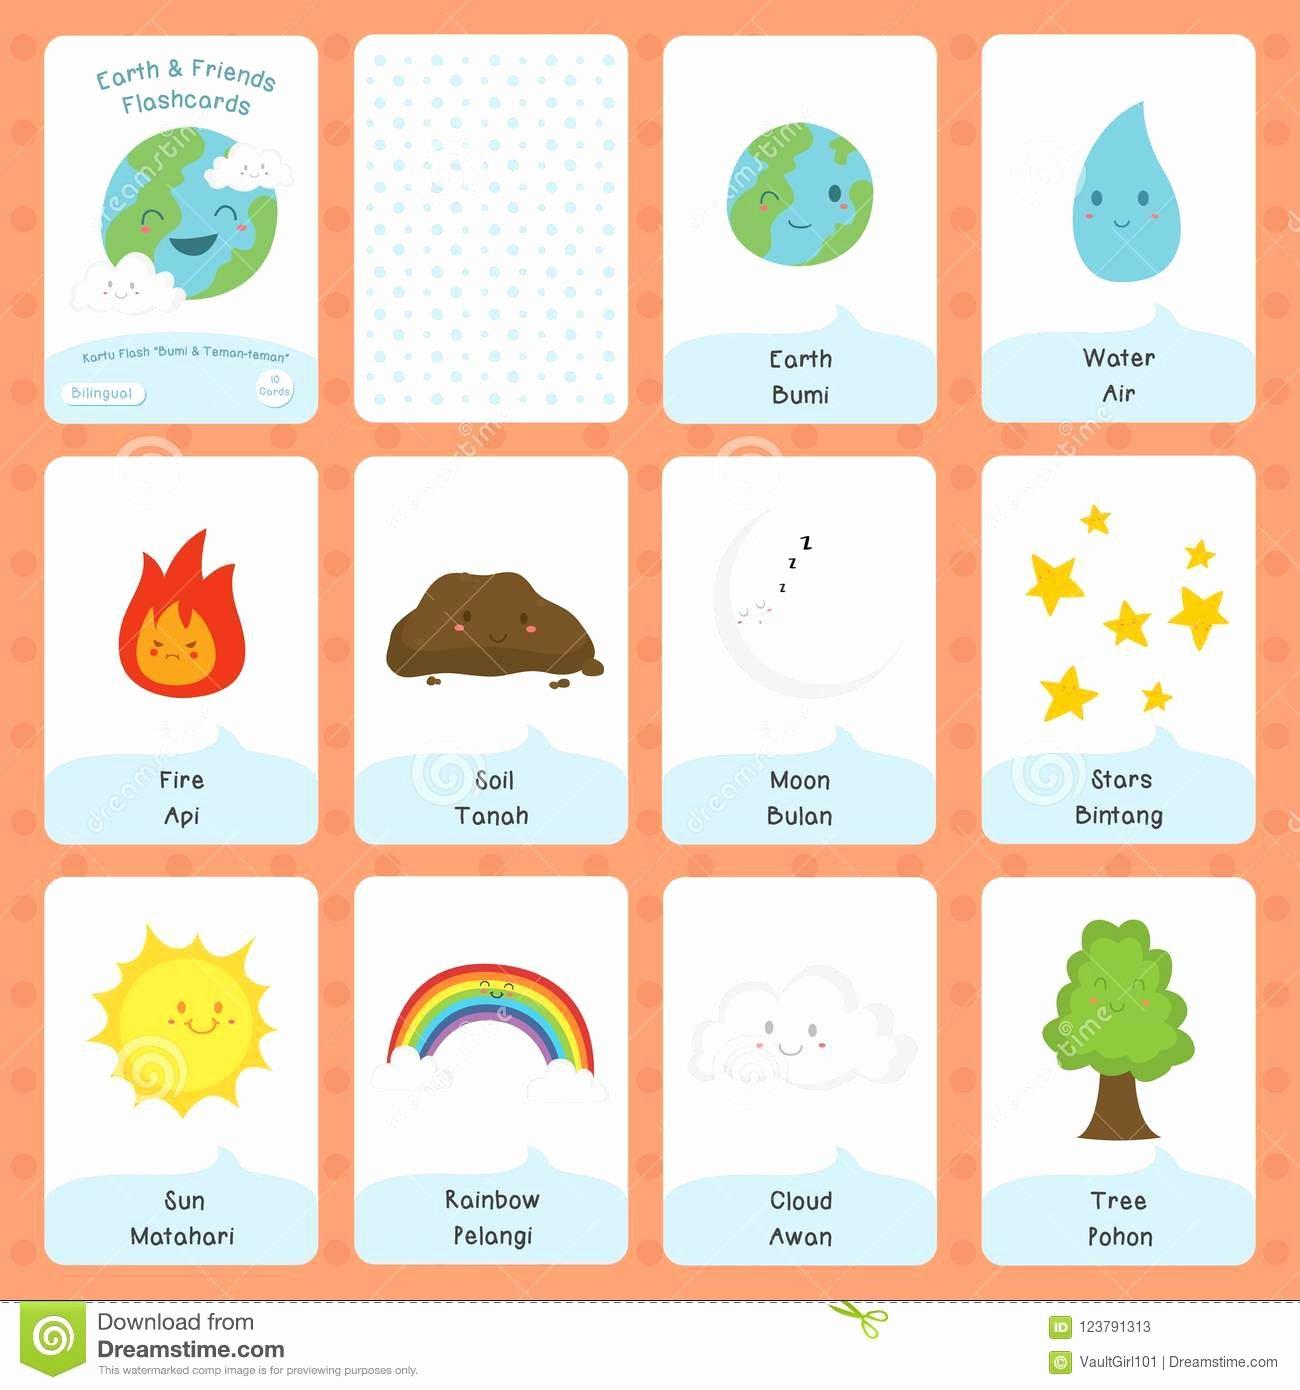 Flash Card Template Pdf Fresh Cute Earth and Friends Bilingual Flashcard Vector Design